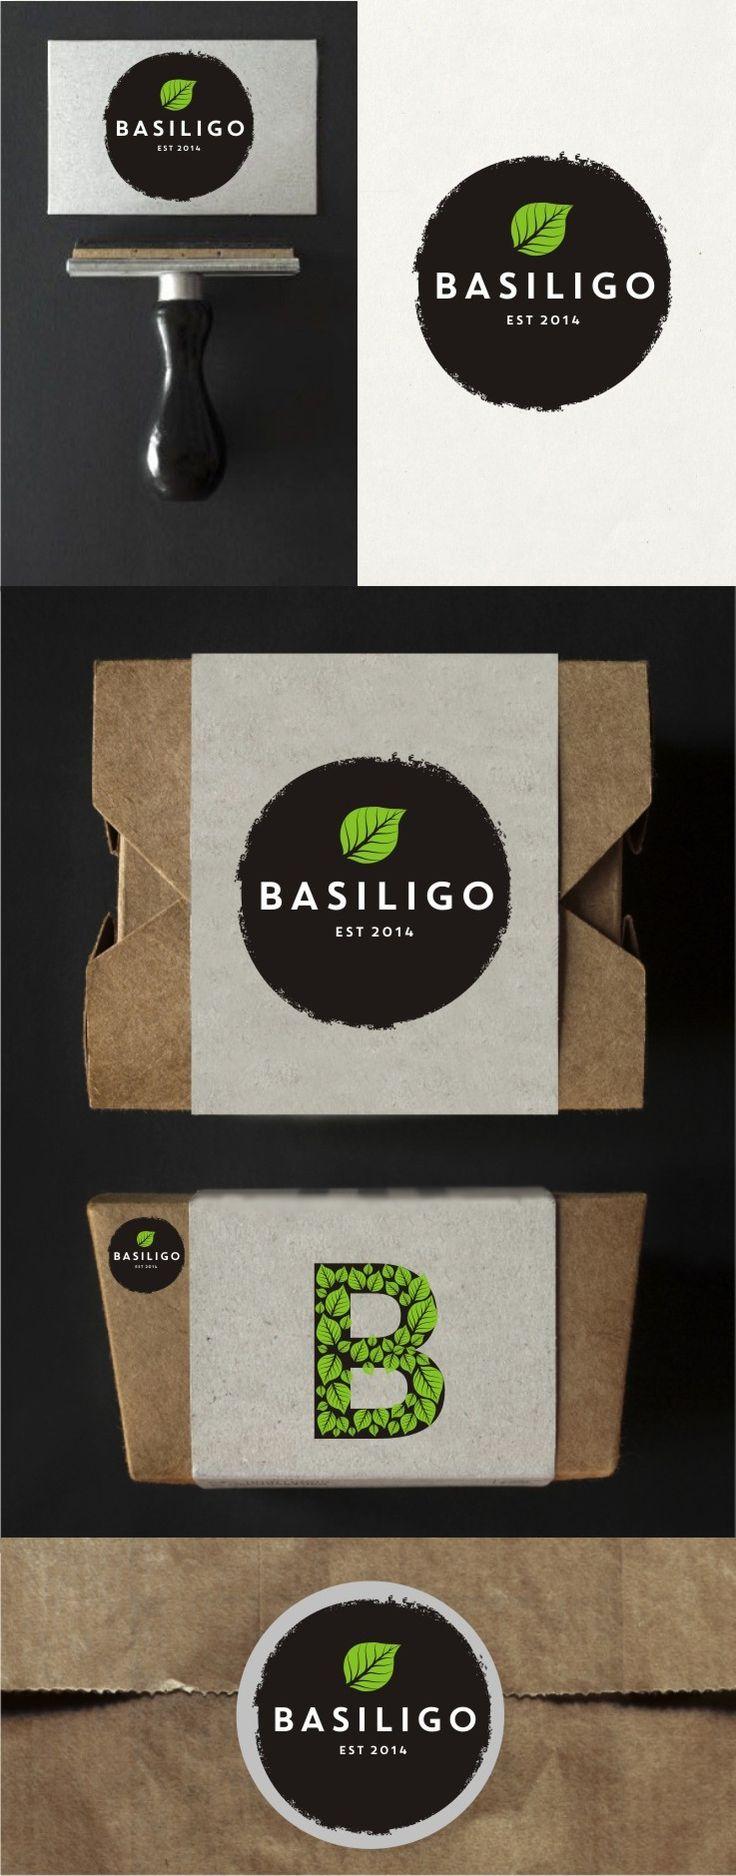 Create logo for gourmet food delivery startup company - Basiligo